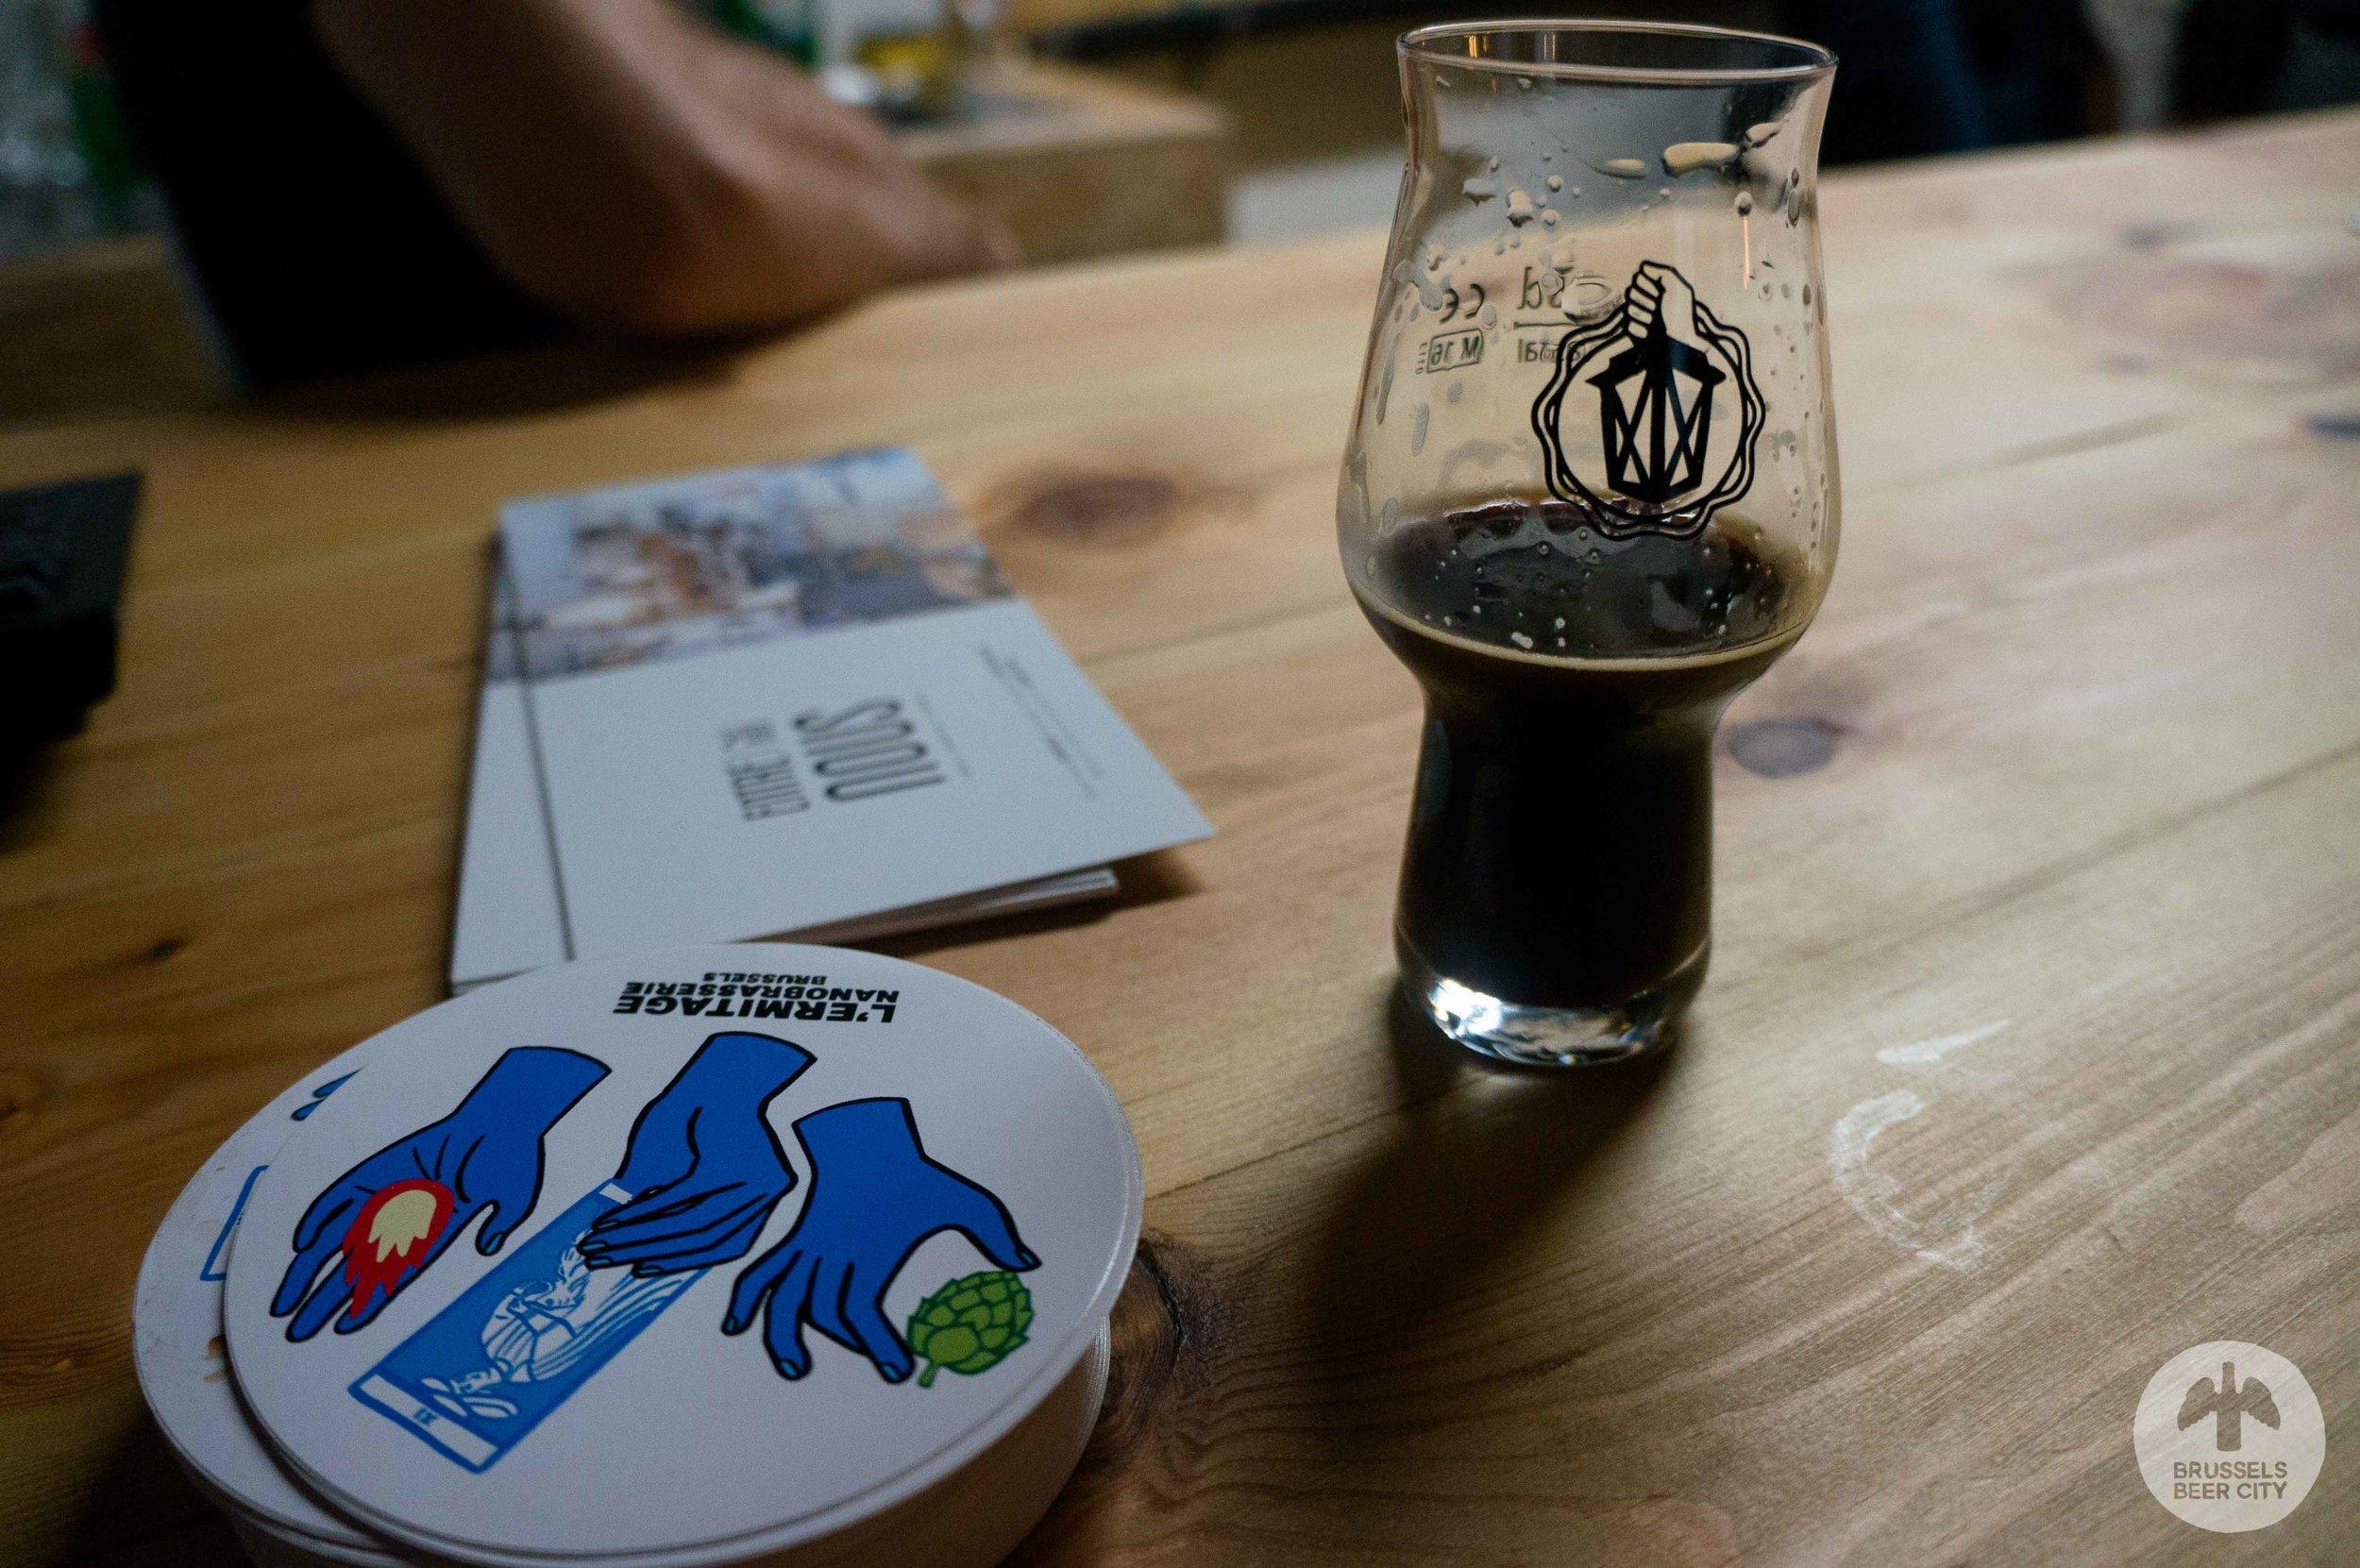 Mitraillette beer pairing